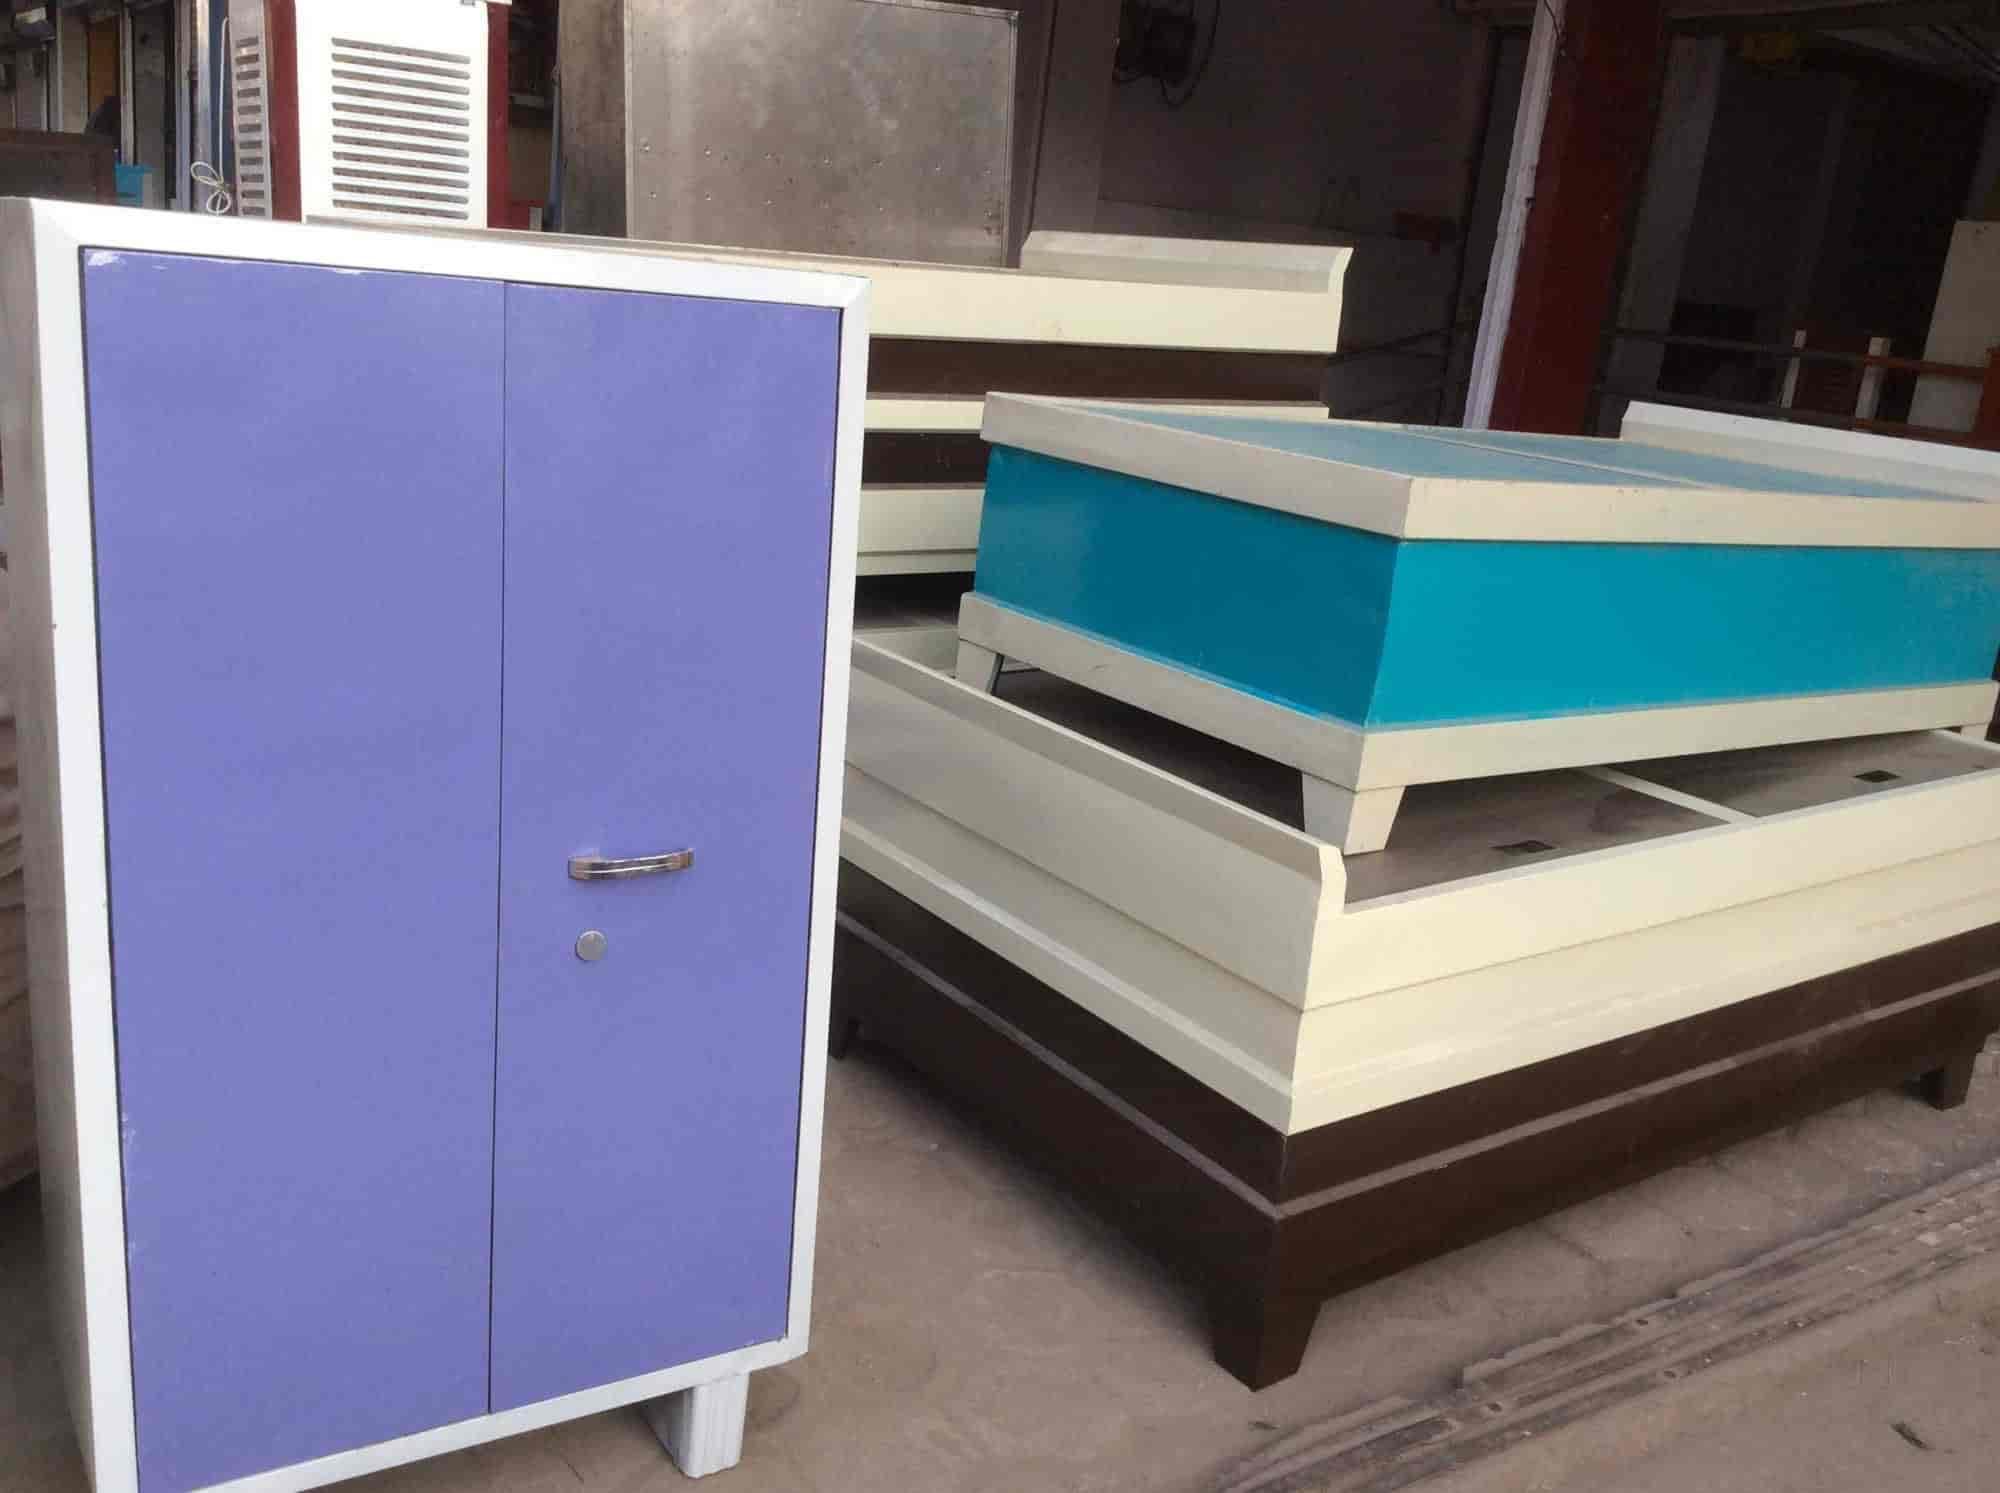 steel furniture images. Cupboards - Sagar Steel Furniture Photos, Juni, Indore Stainless Dealers Images